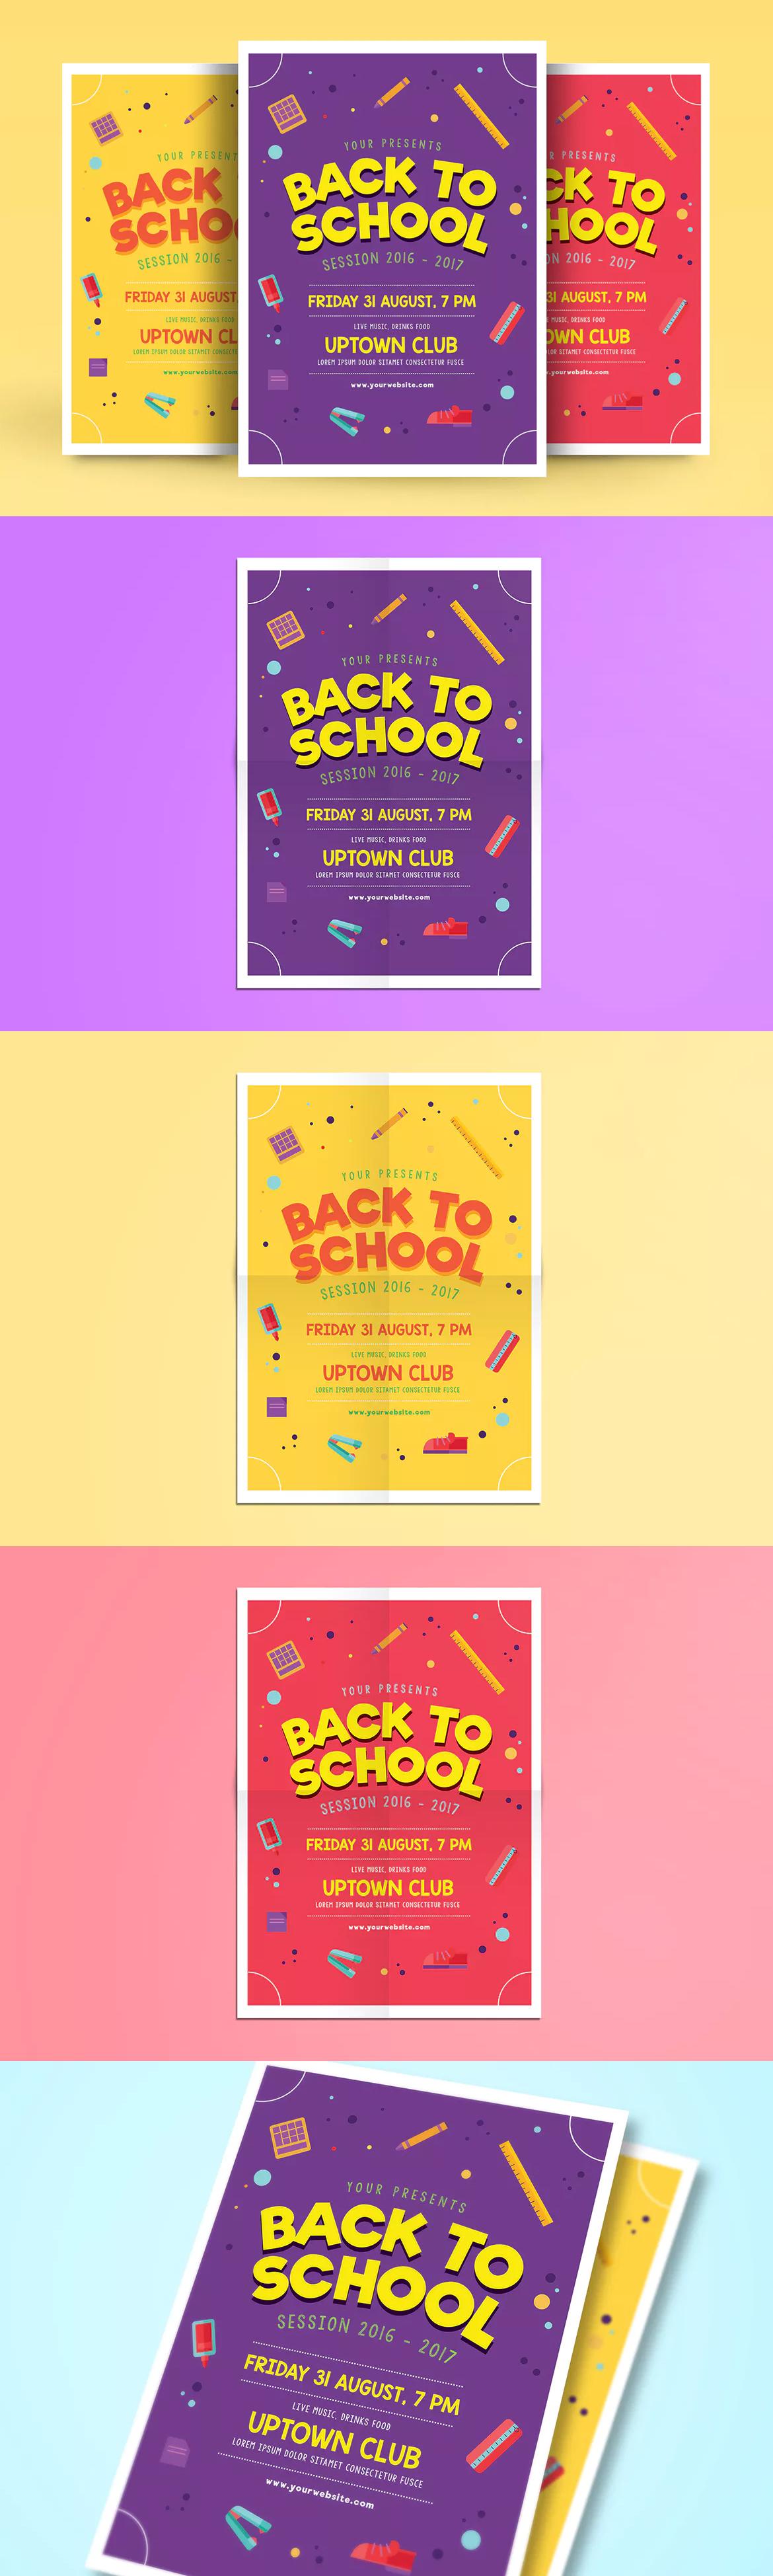 Back to School Flyer Template AI, PSD A4 | Flyer Design Templates ...